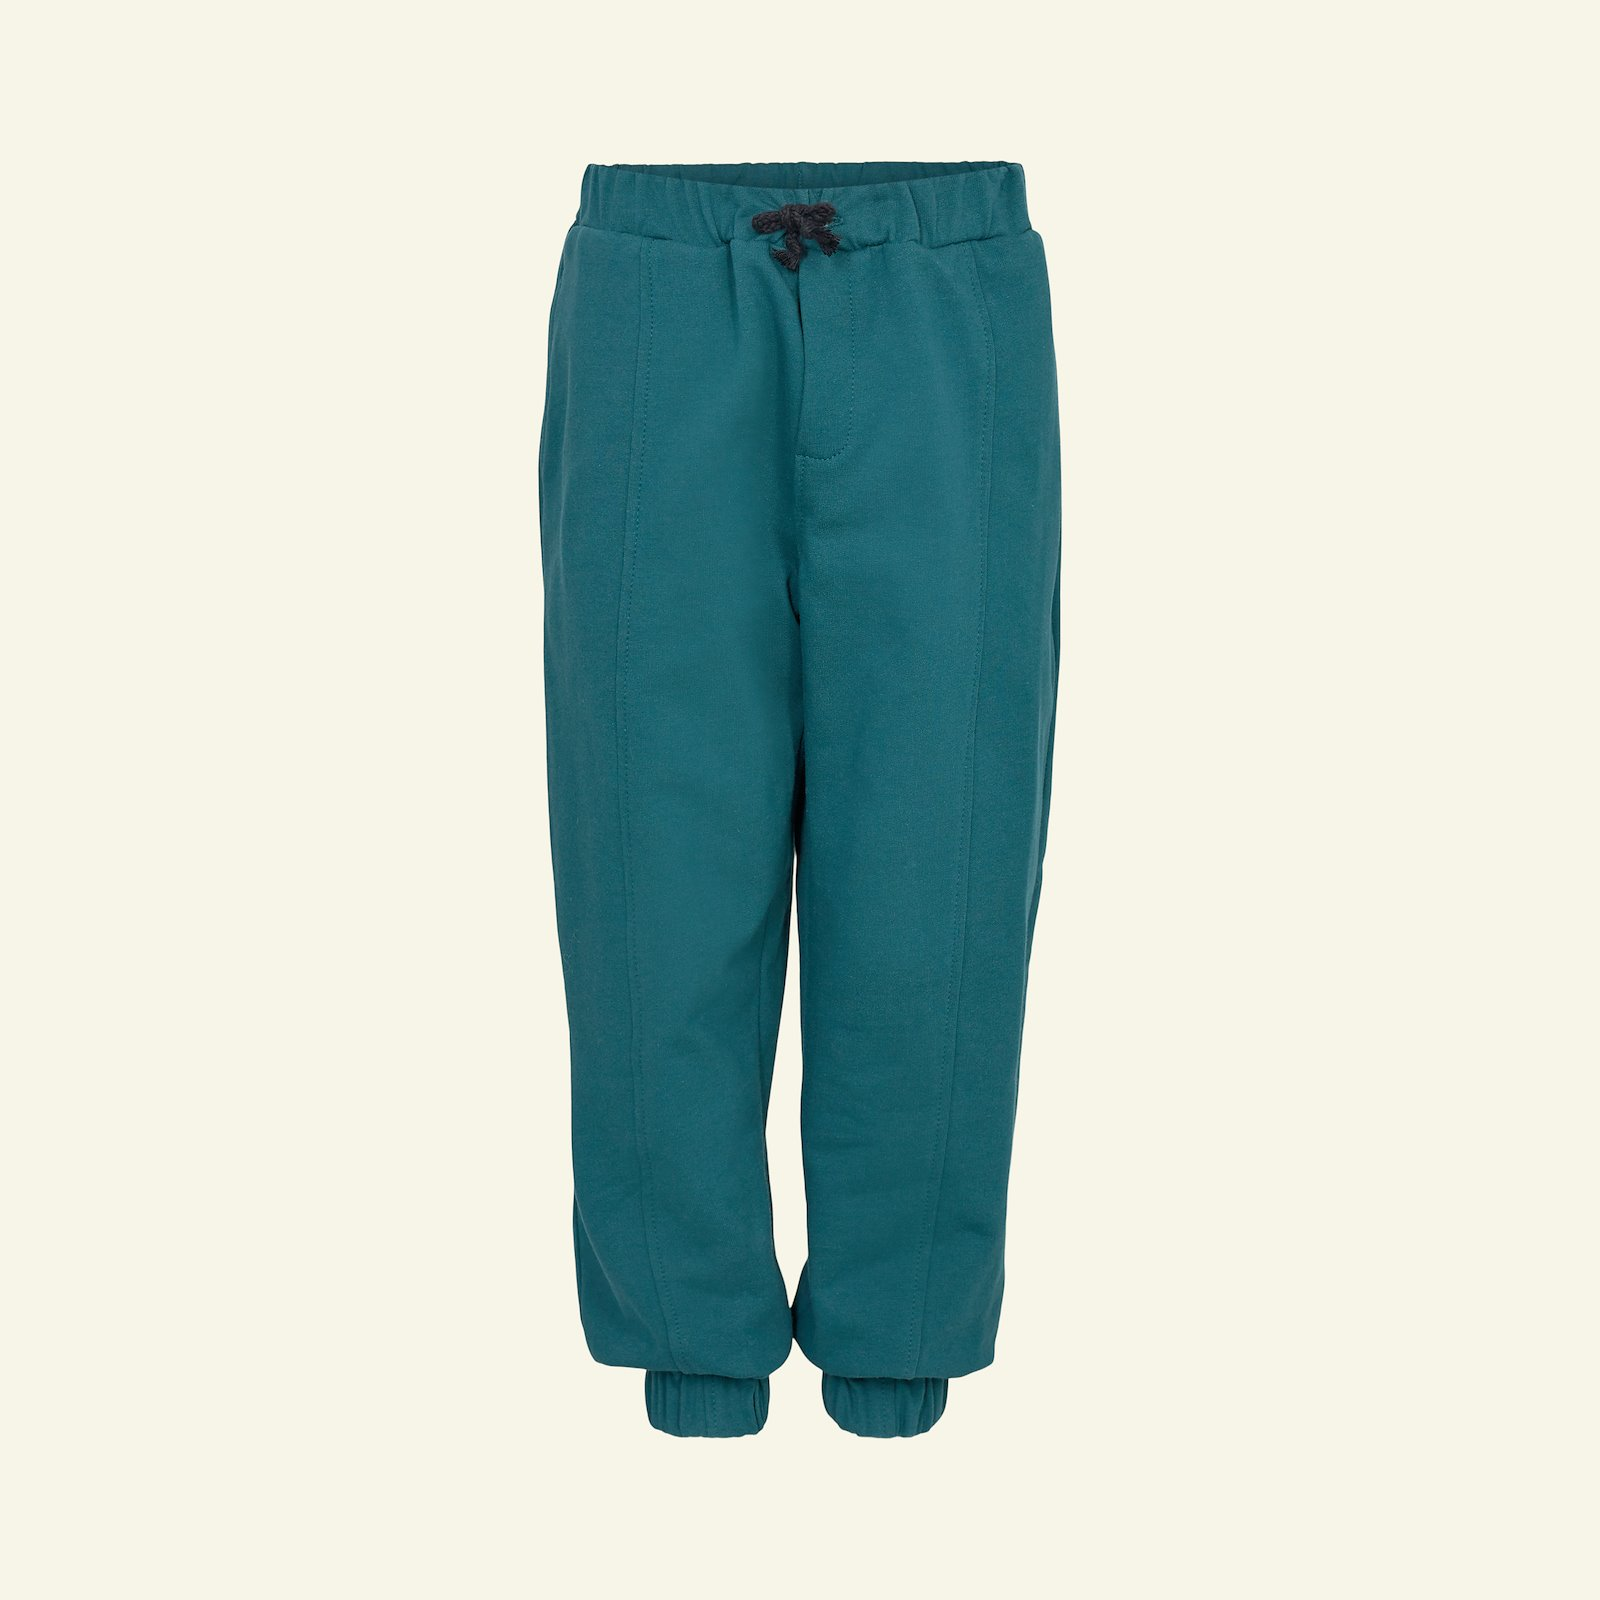 Sweat pants, 122/7y p60040_211775_75243_sskit